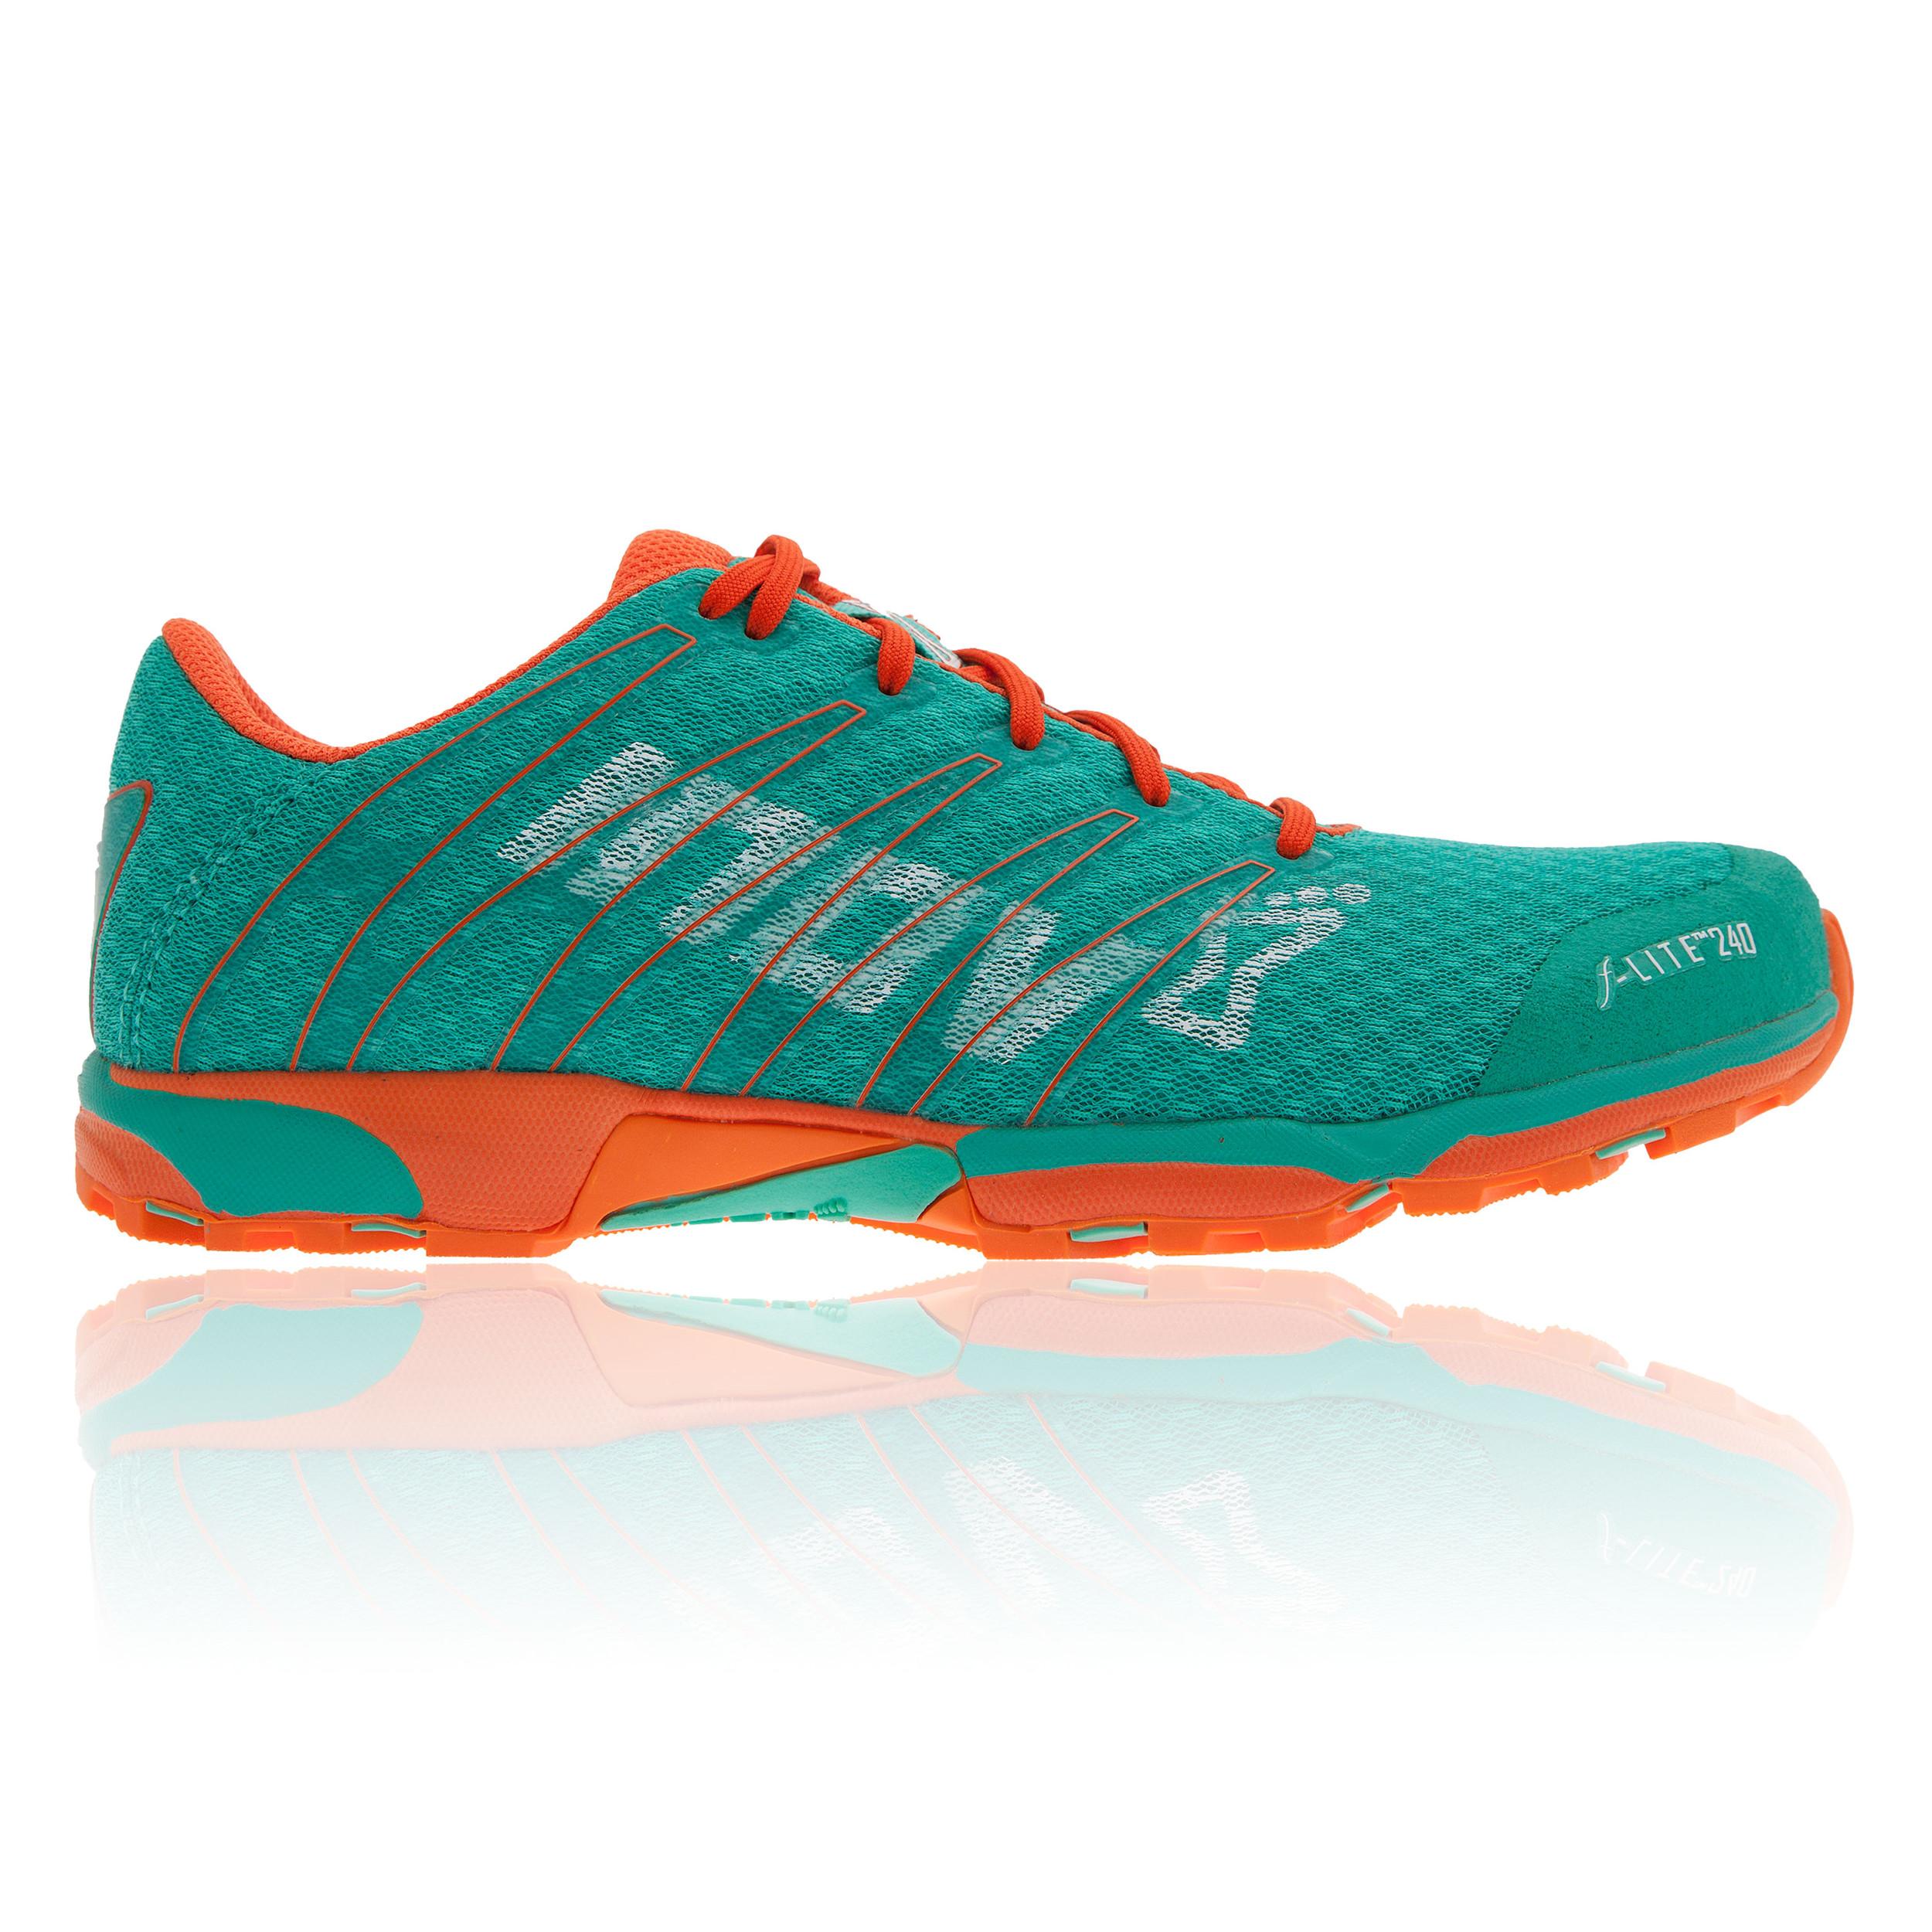 Inov8 F-Lite 240 Women's Fitness Shoes - AW14